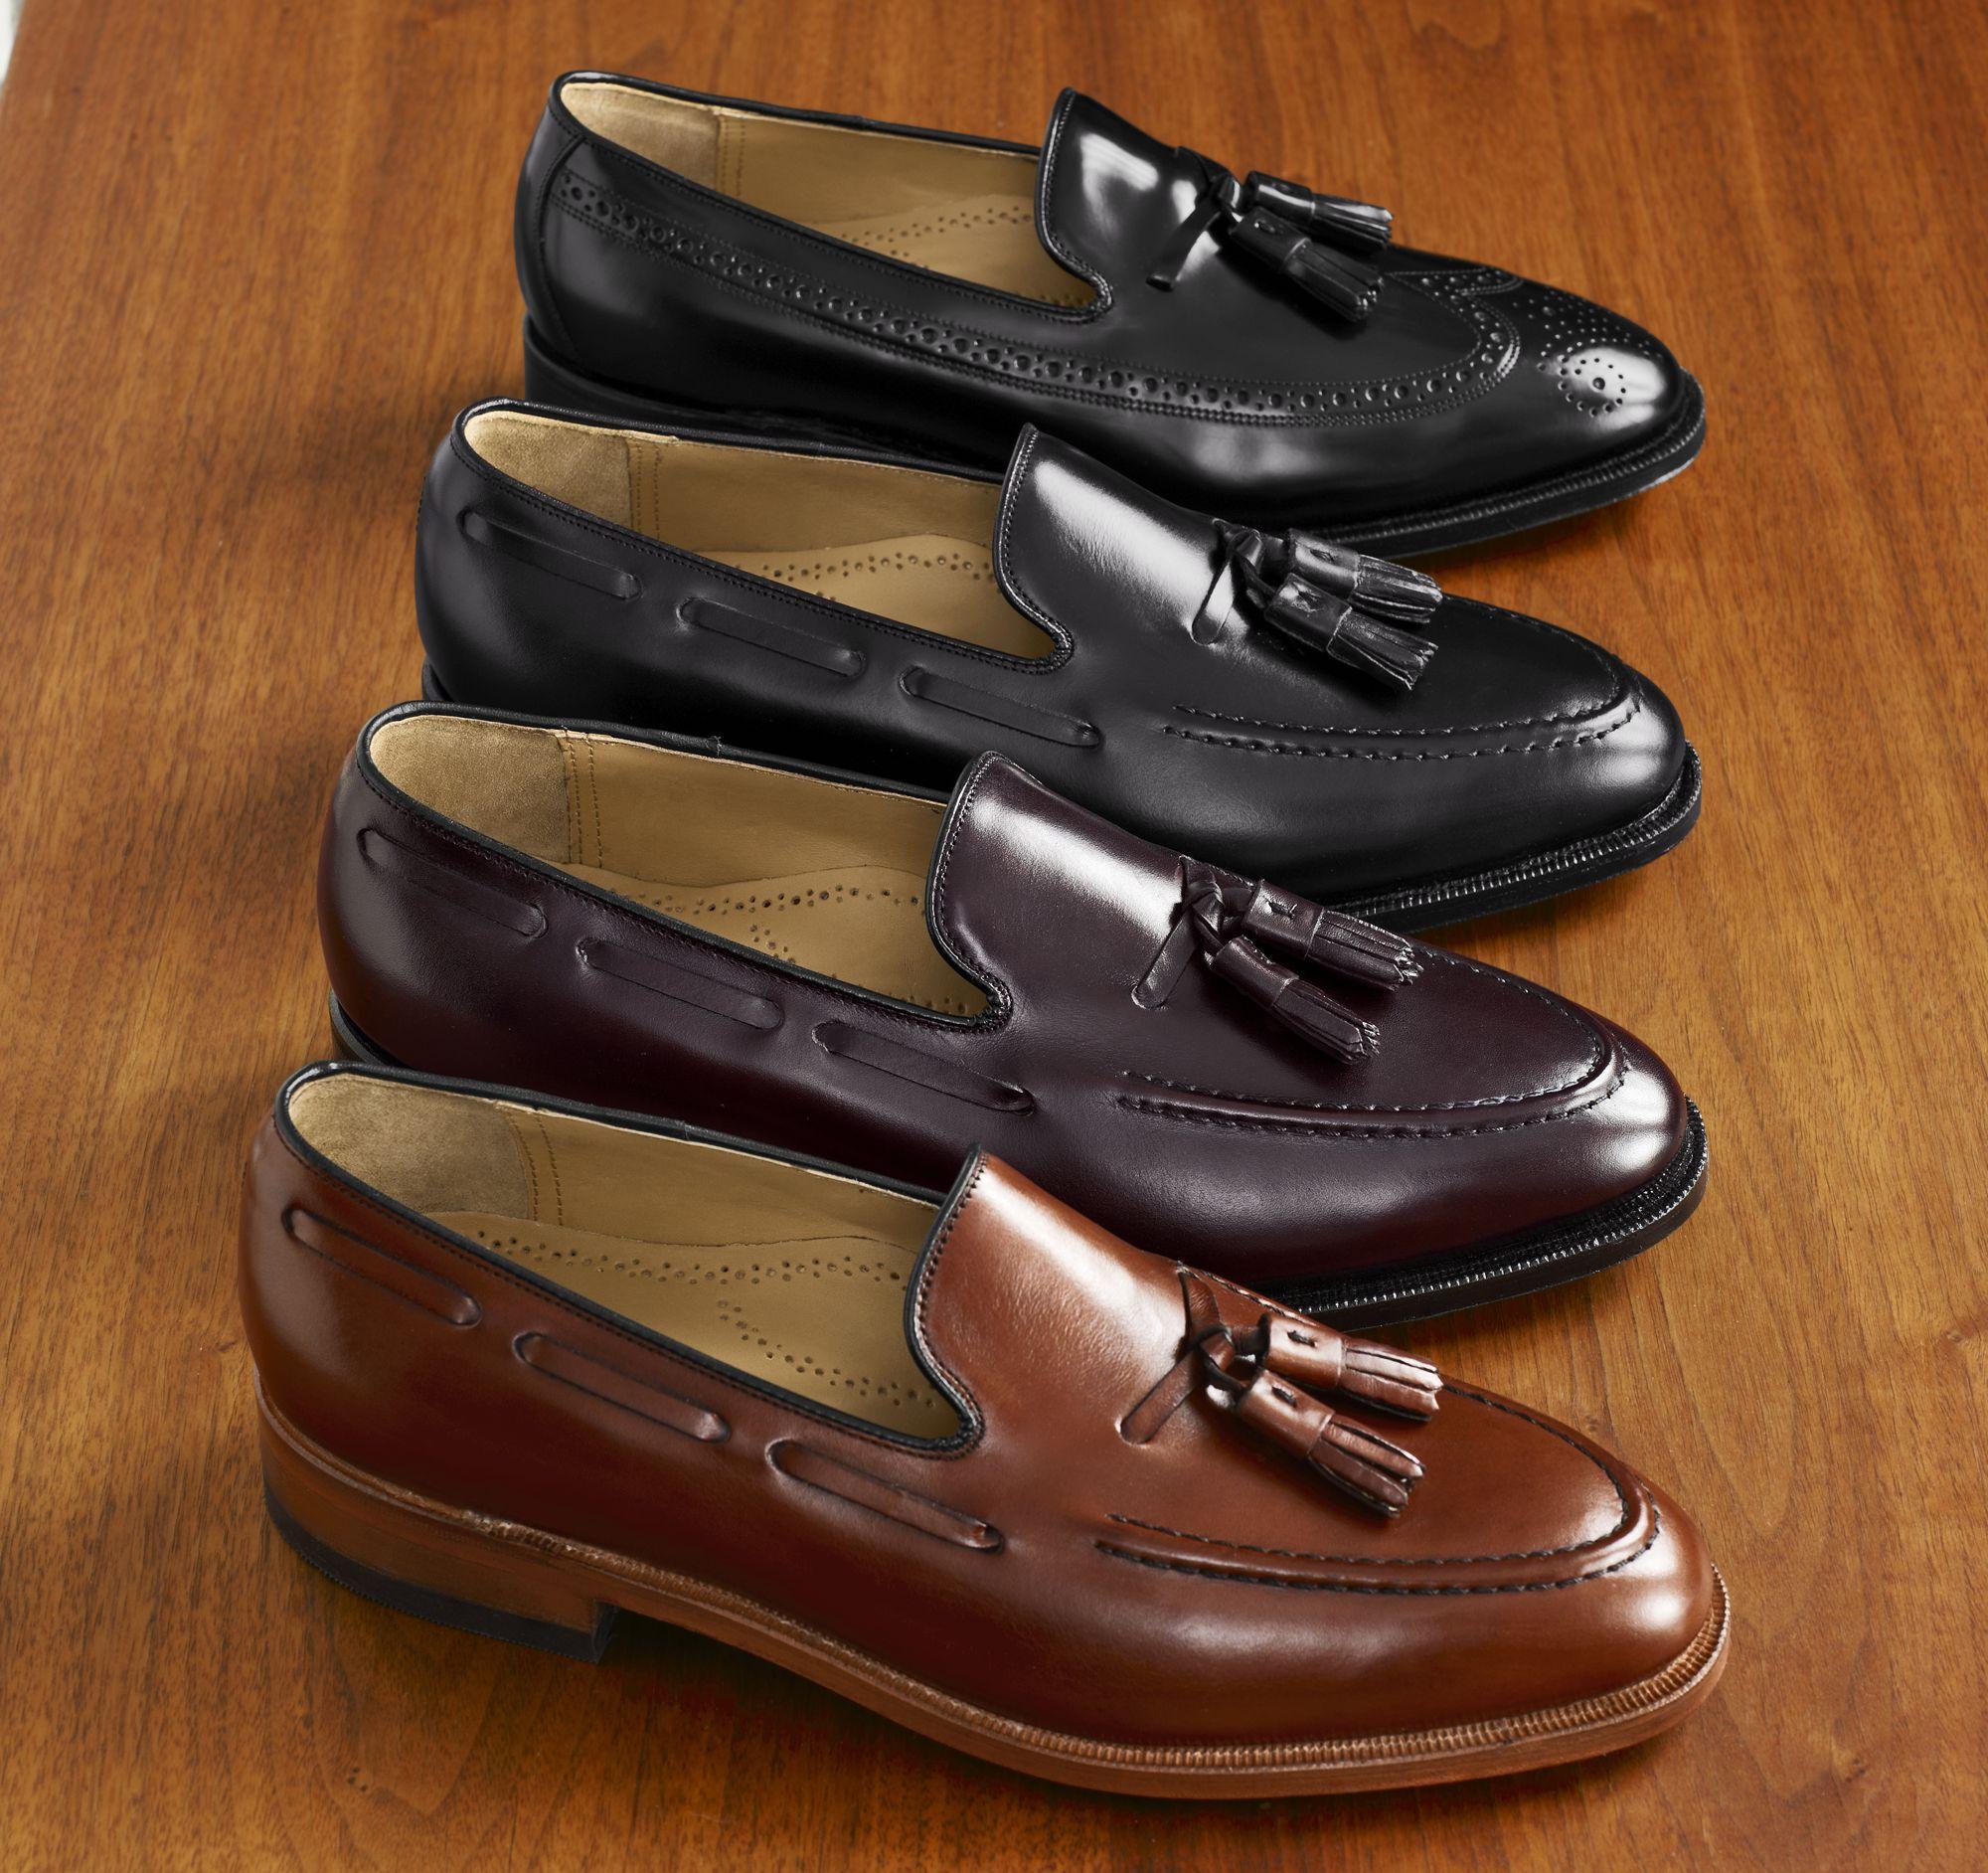 Deerfield Shoe Store